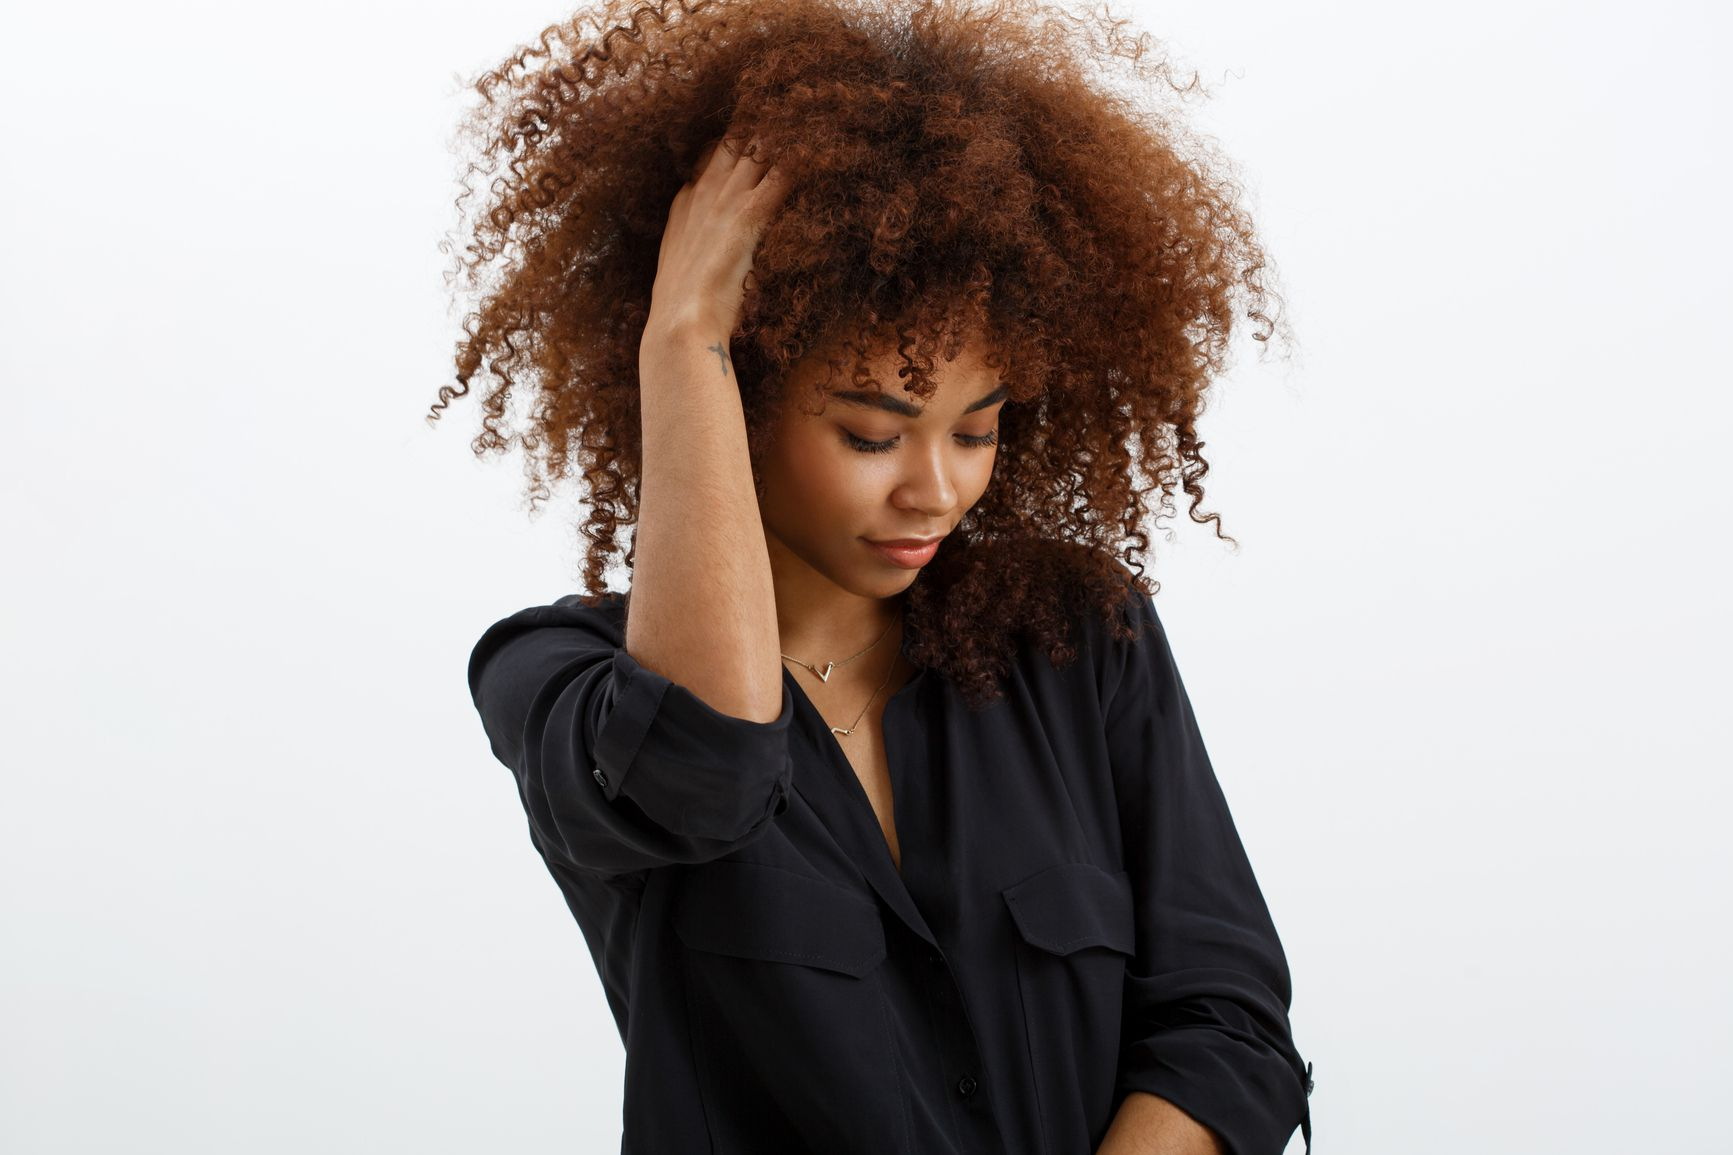 black woman touching her hair